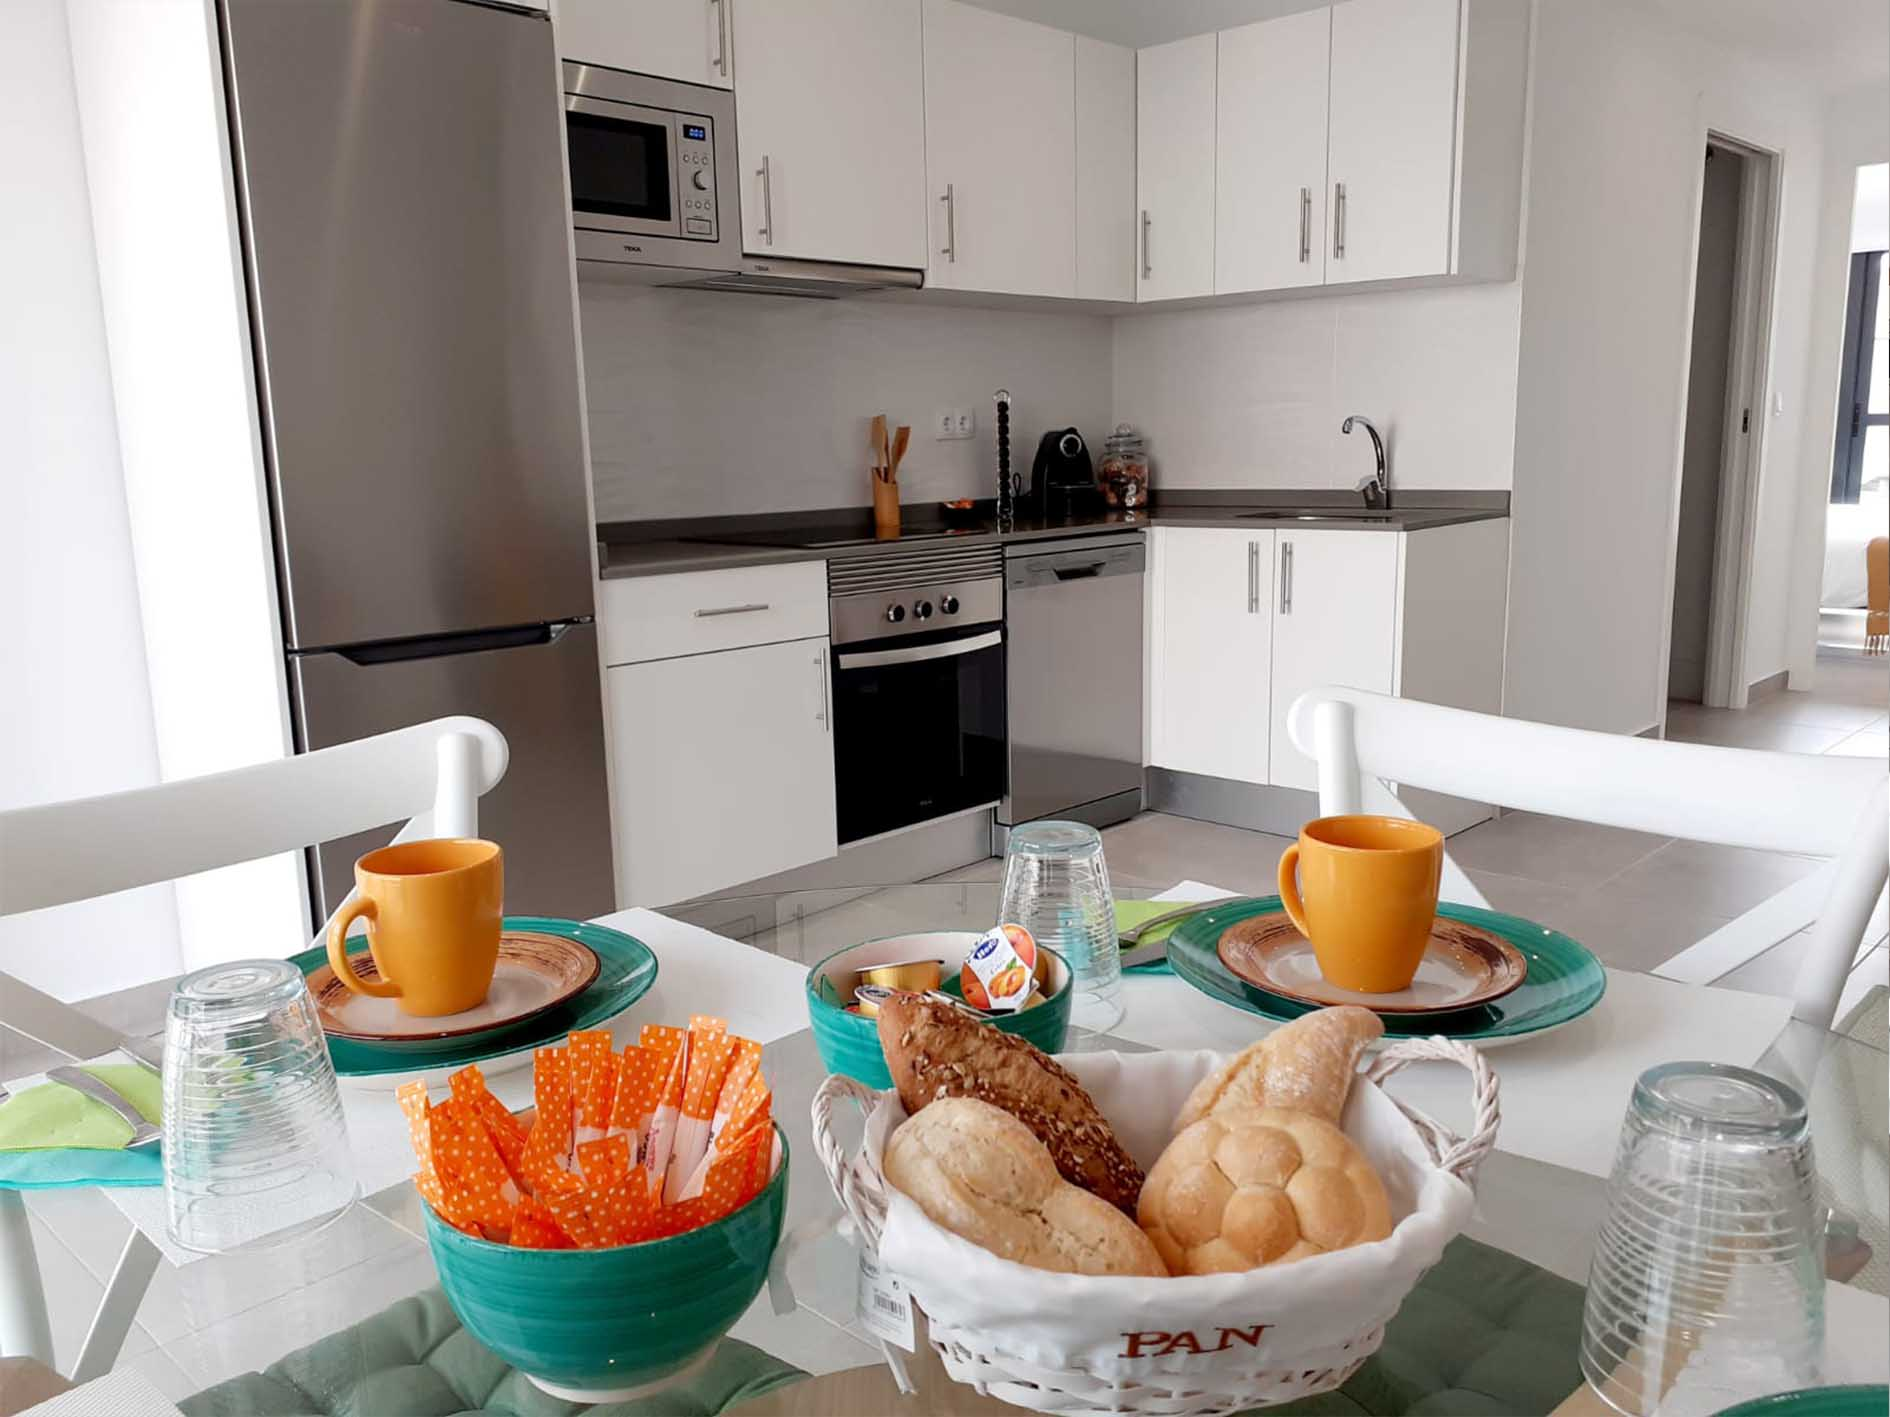 immobilier neuf espagne costa blanca on-d13 levansur home three cuisine 2